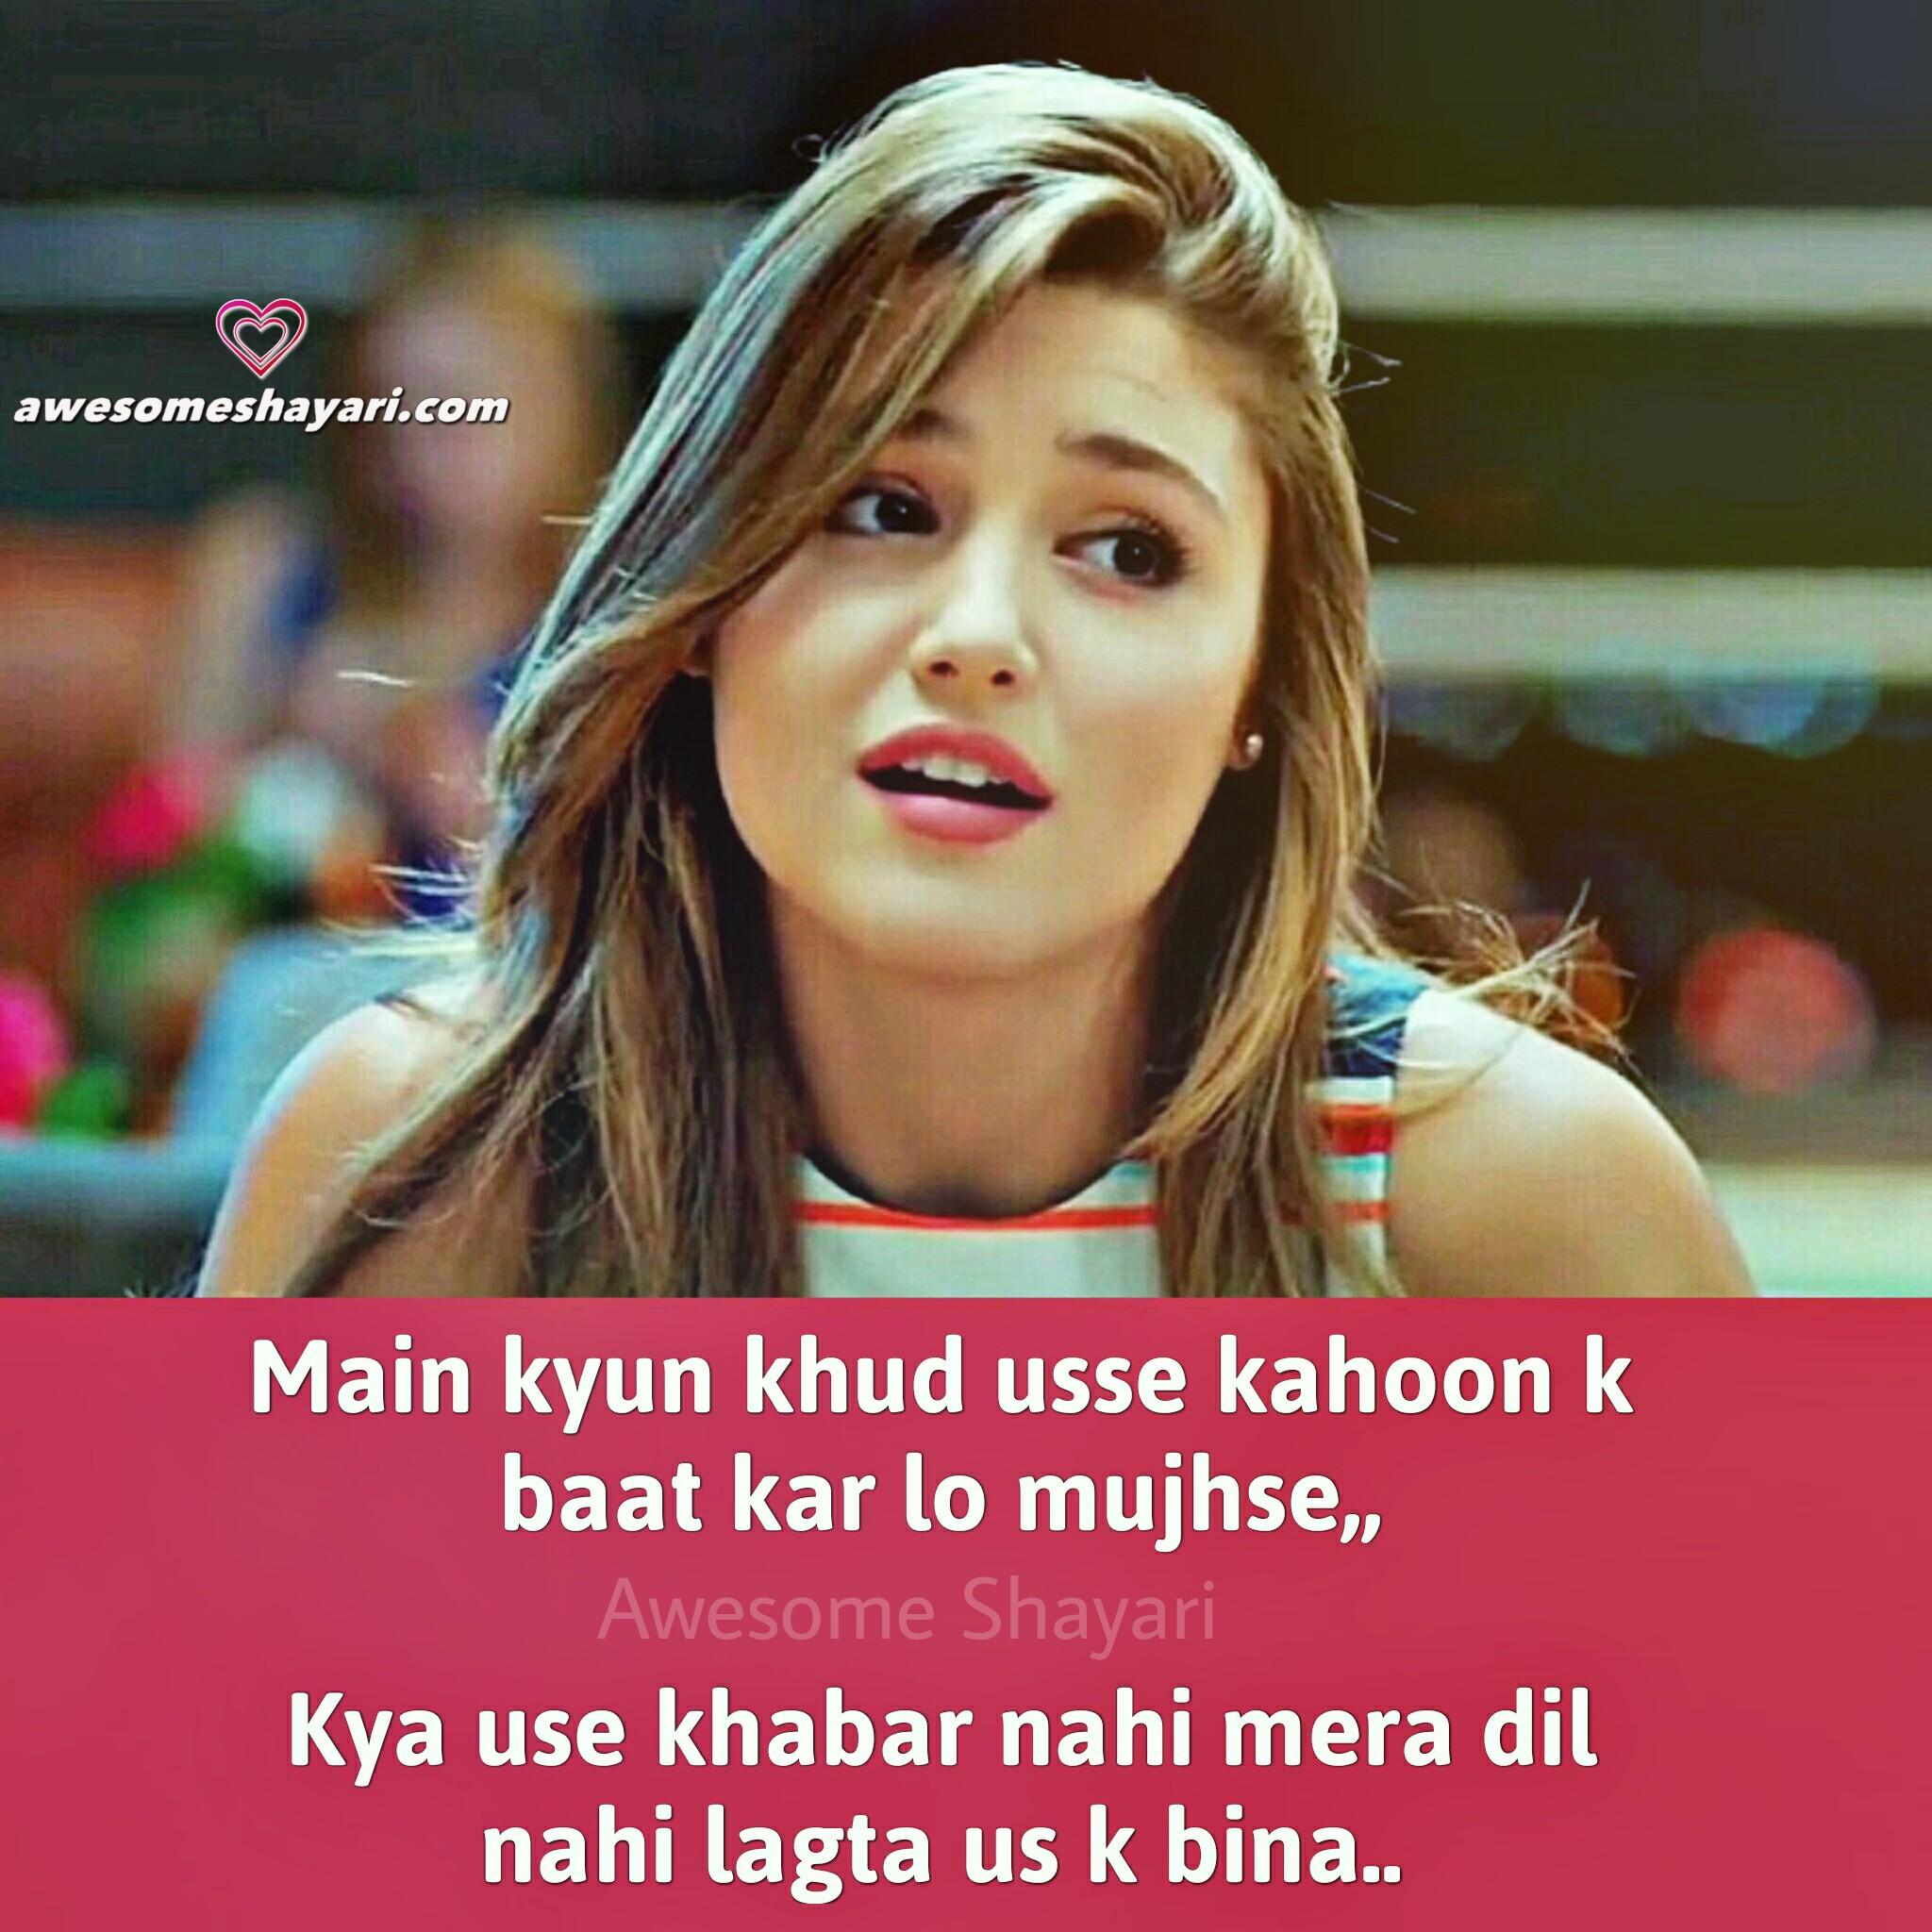 hande ercel shayari image in hindi